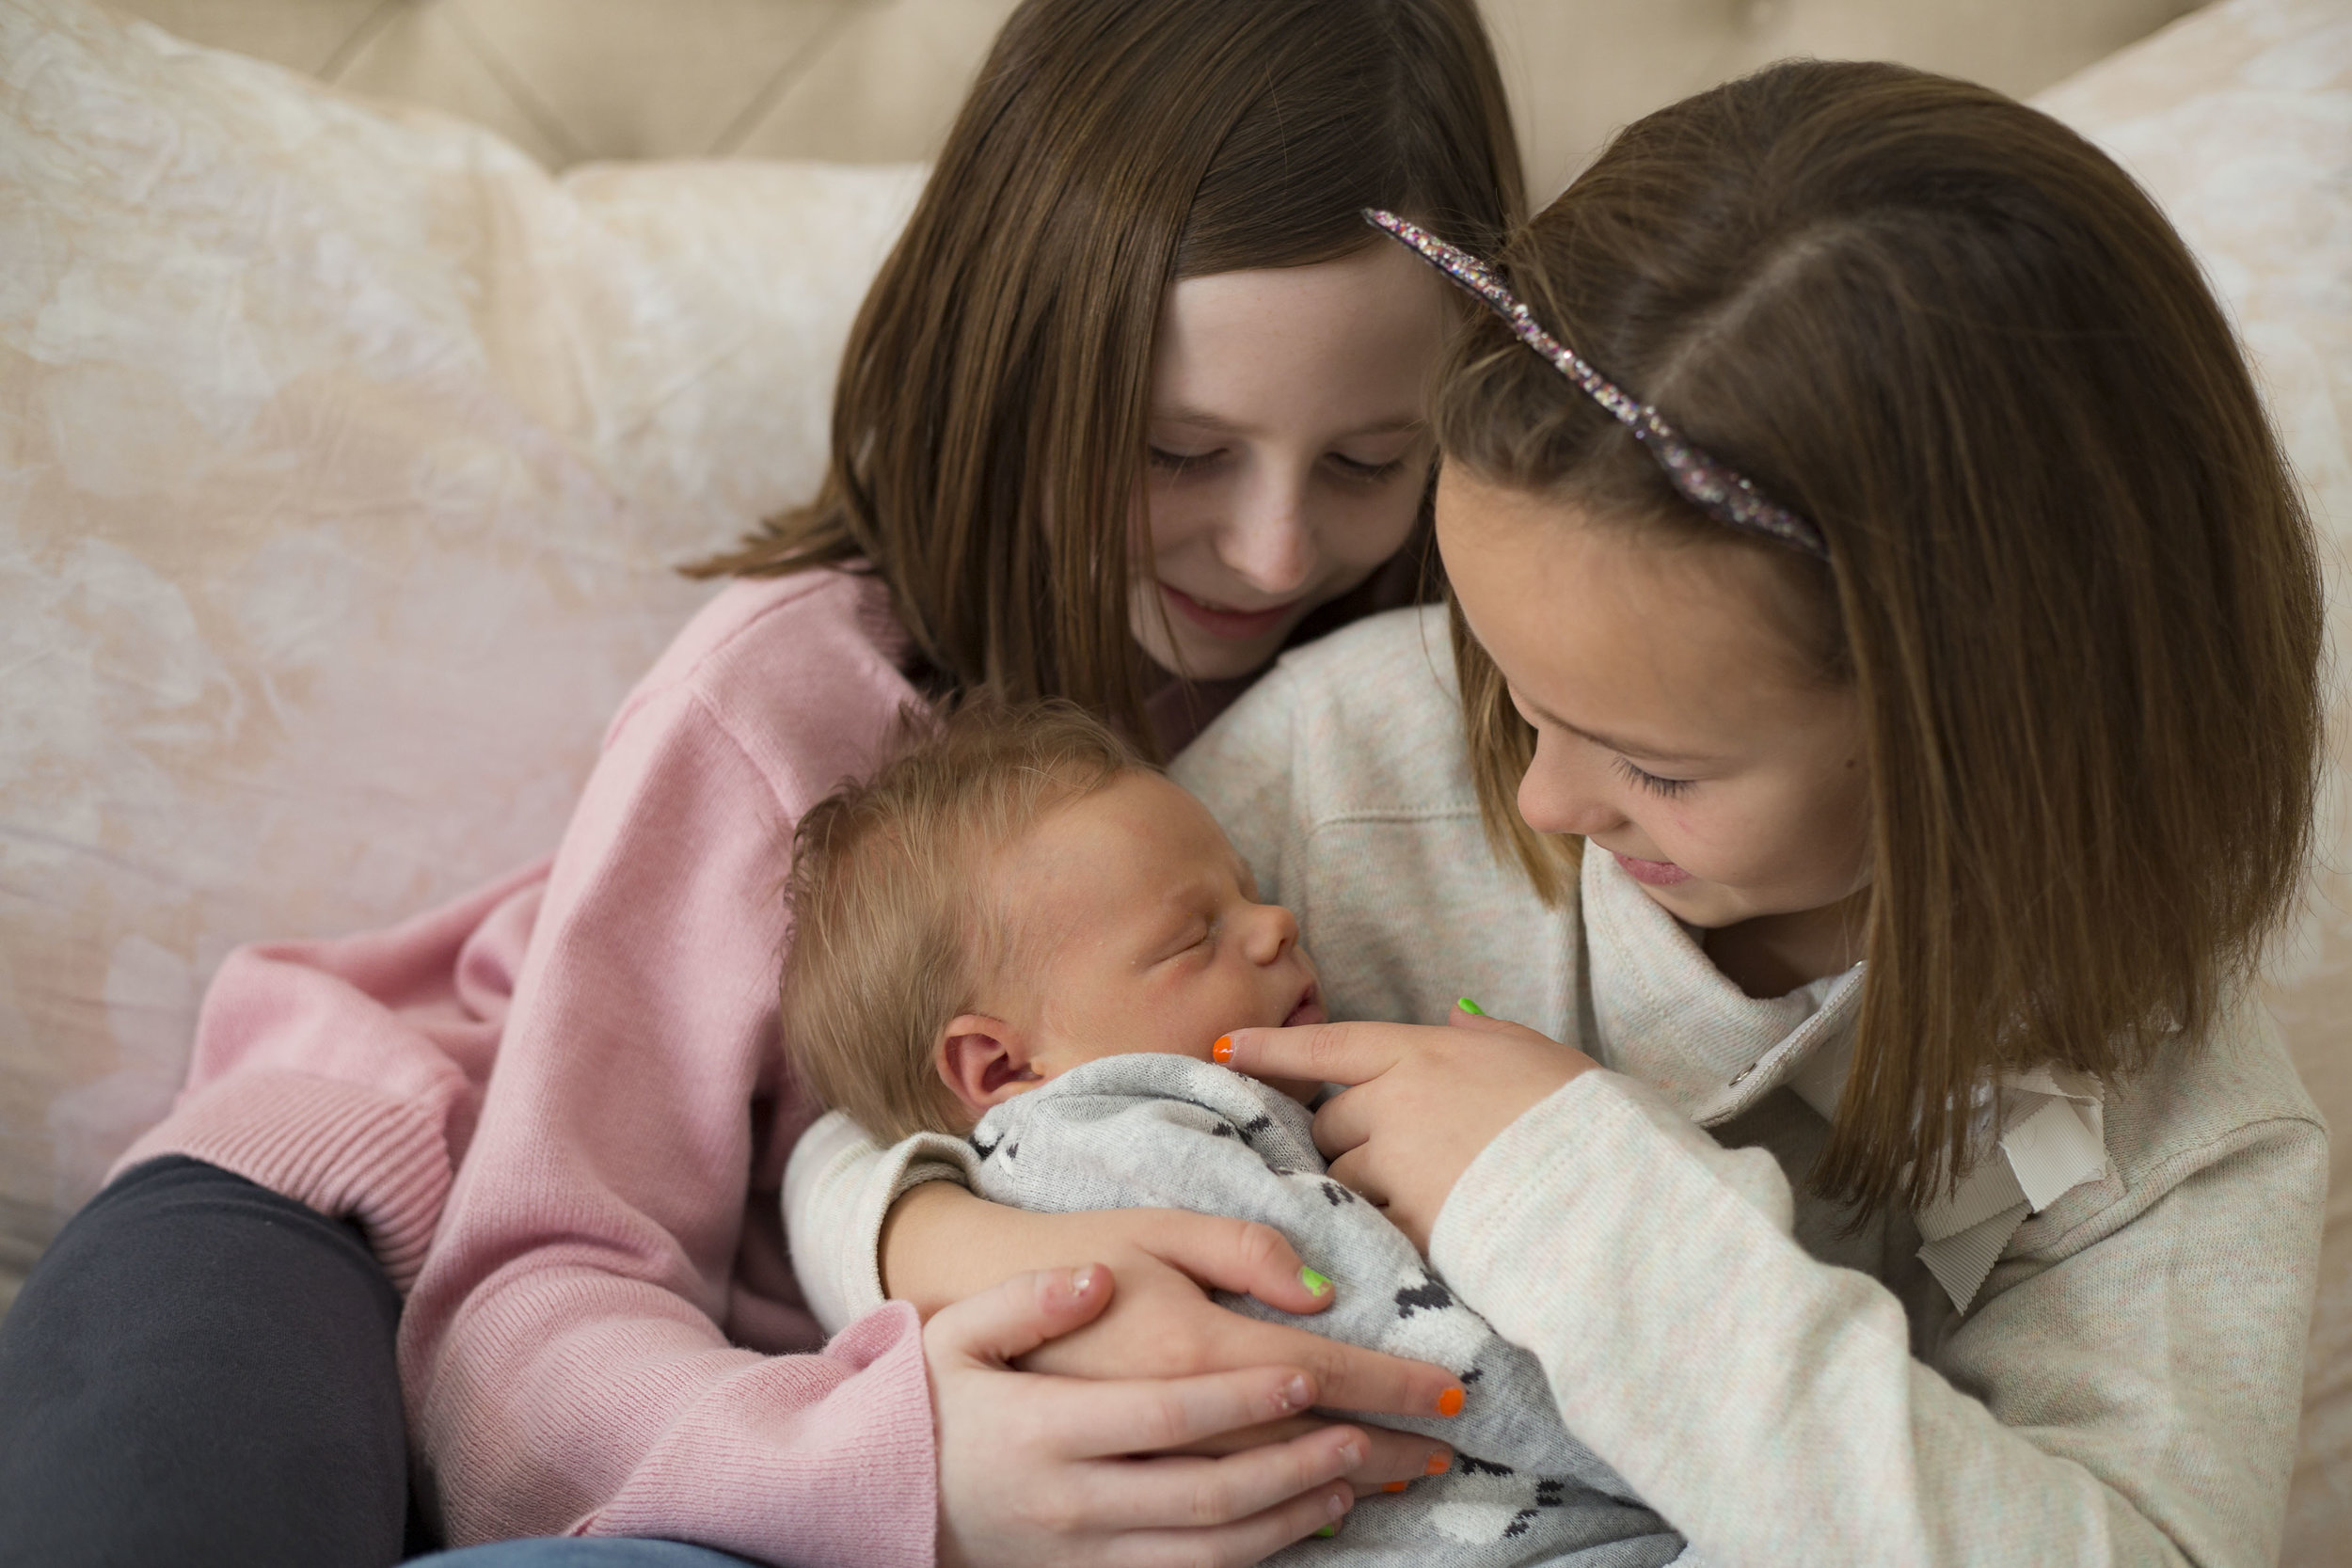 MD-VA-DC-Newborn-Photographer-Tiffany-Abruzzo-Nathan-17.jpg